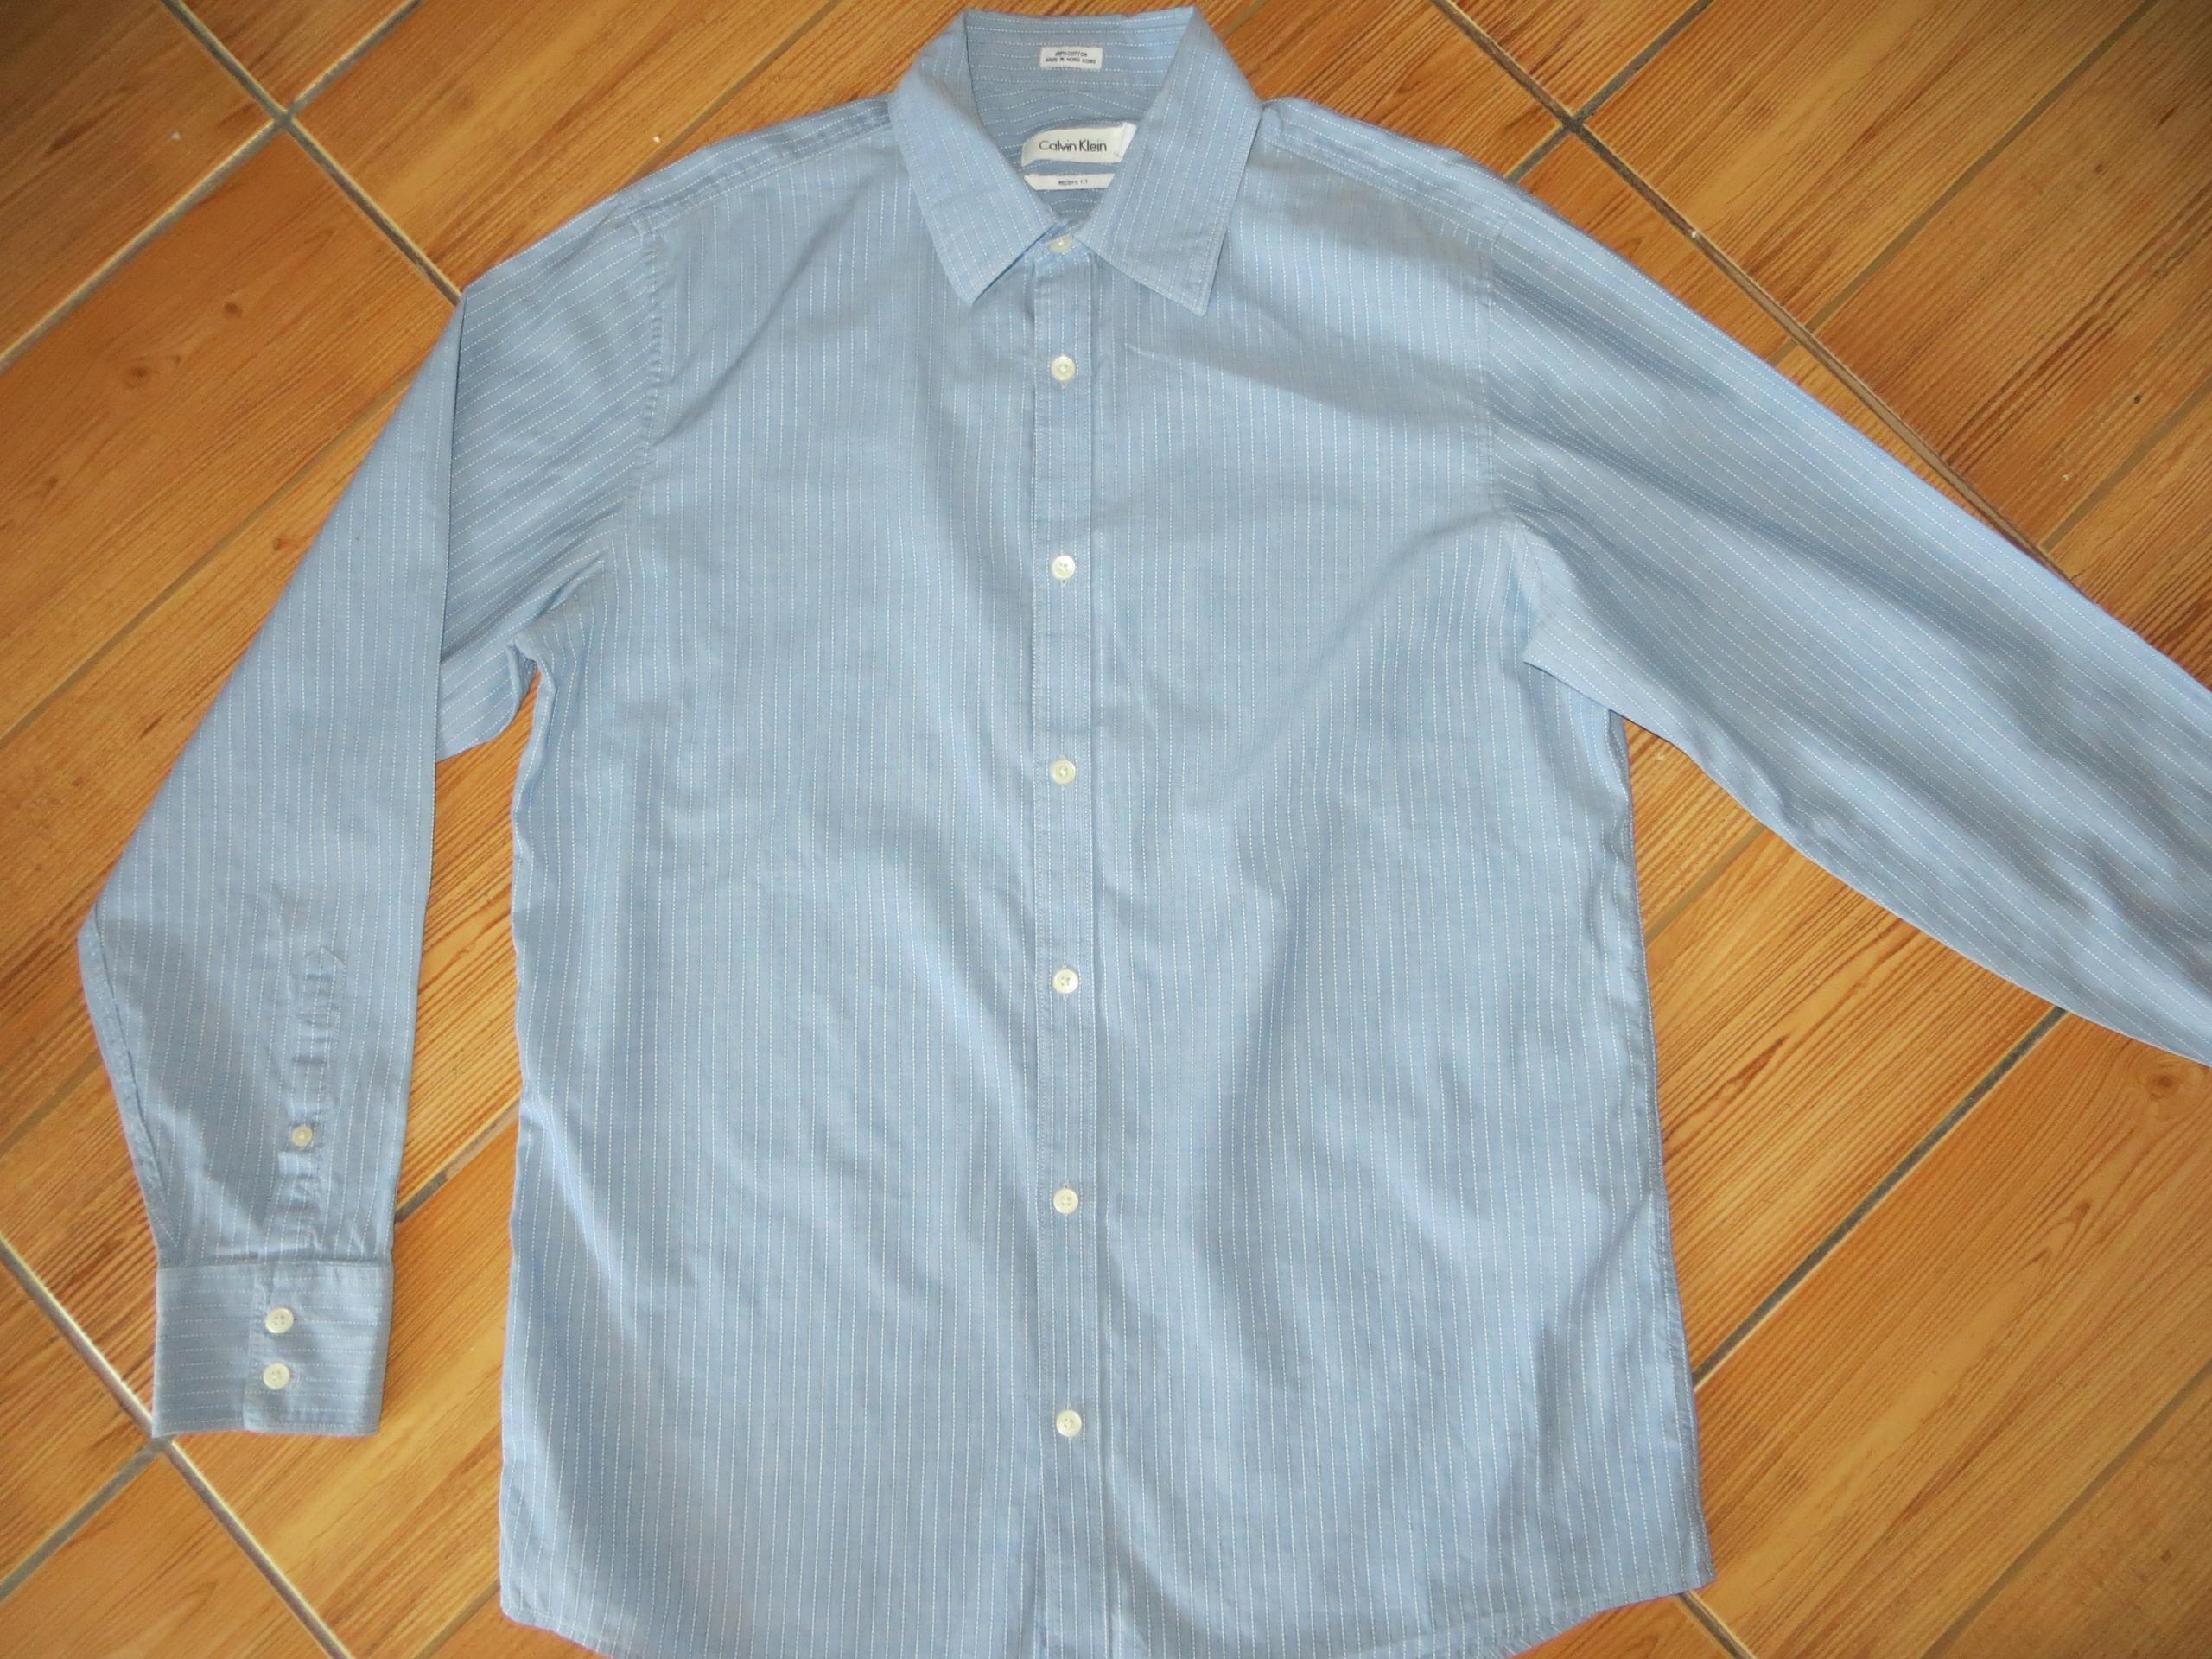 Koszula męska CALVIN KLEIN rozmiar M